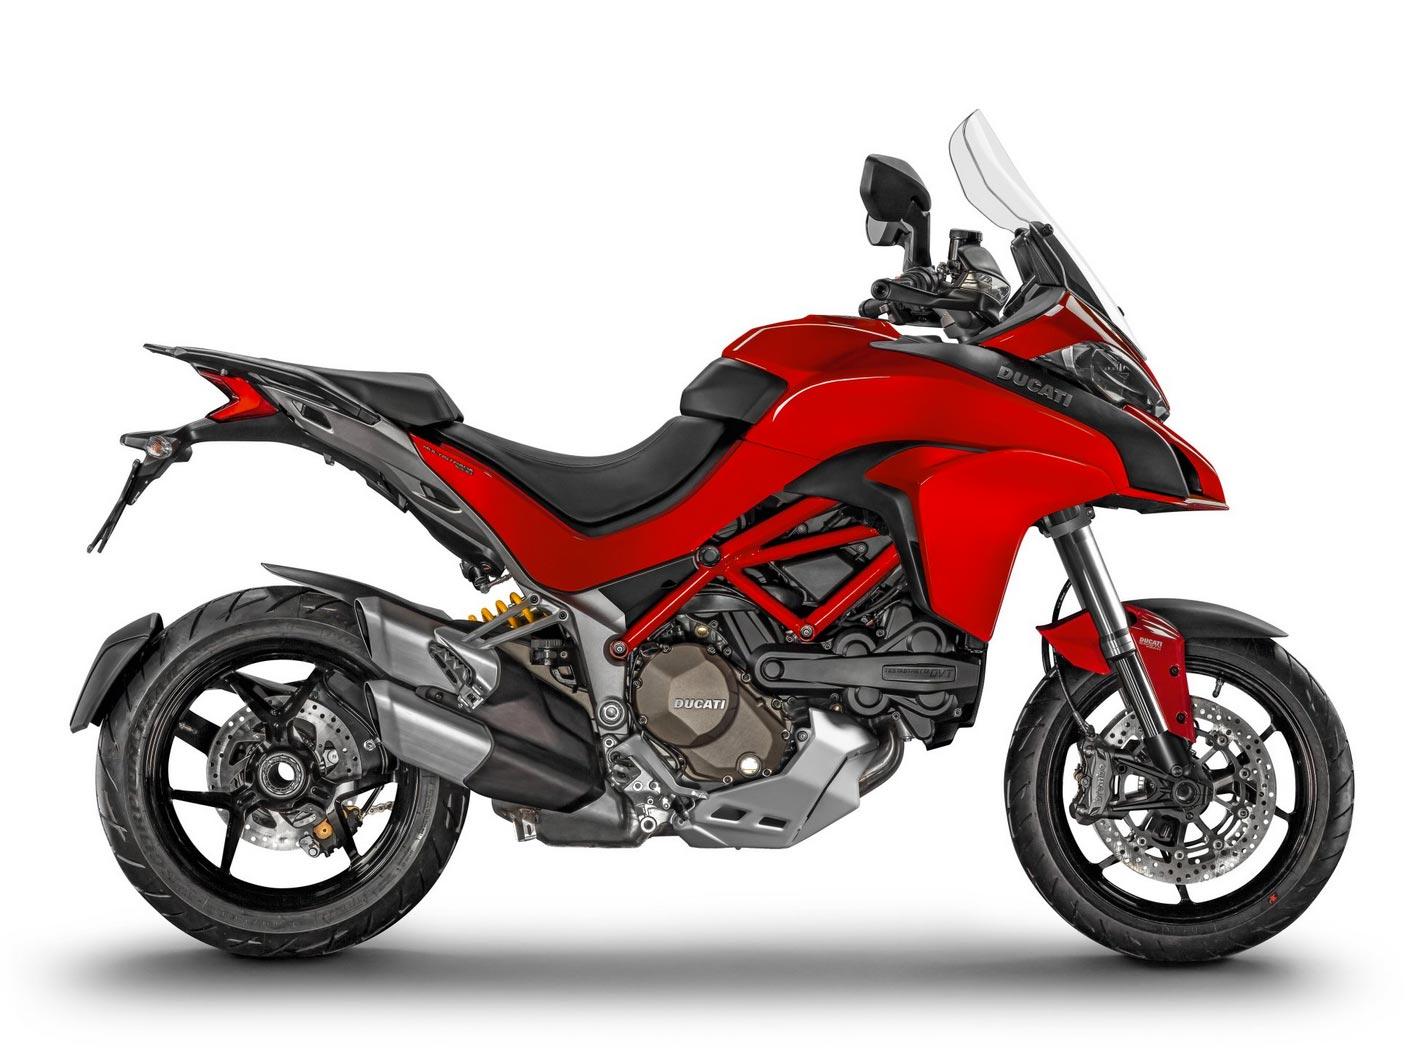 Ducati Multistrada 1200 ABS 2015 Rot